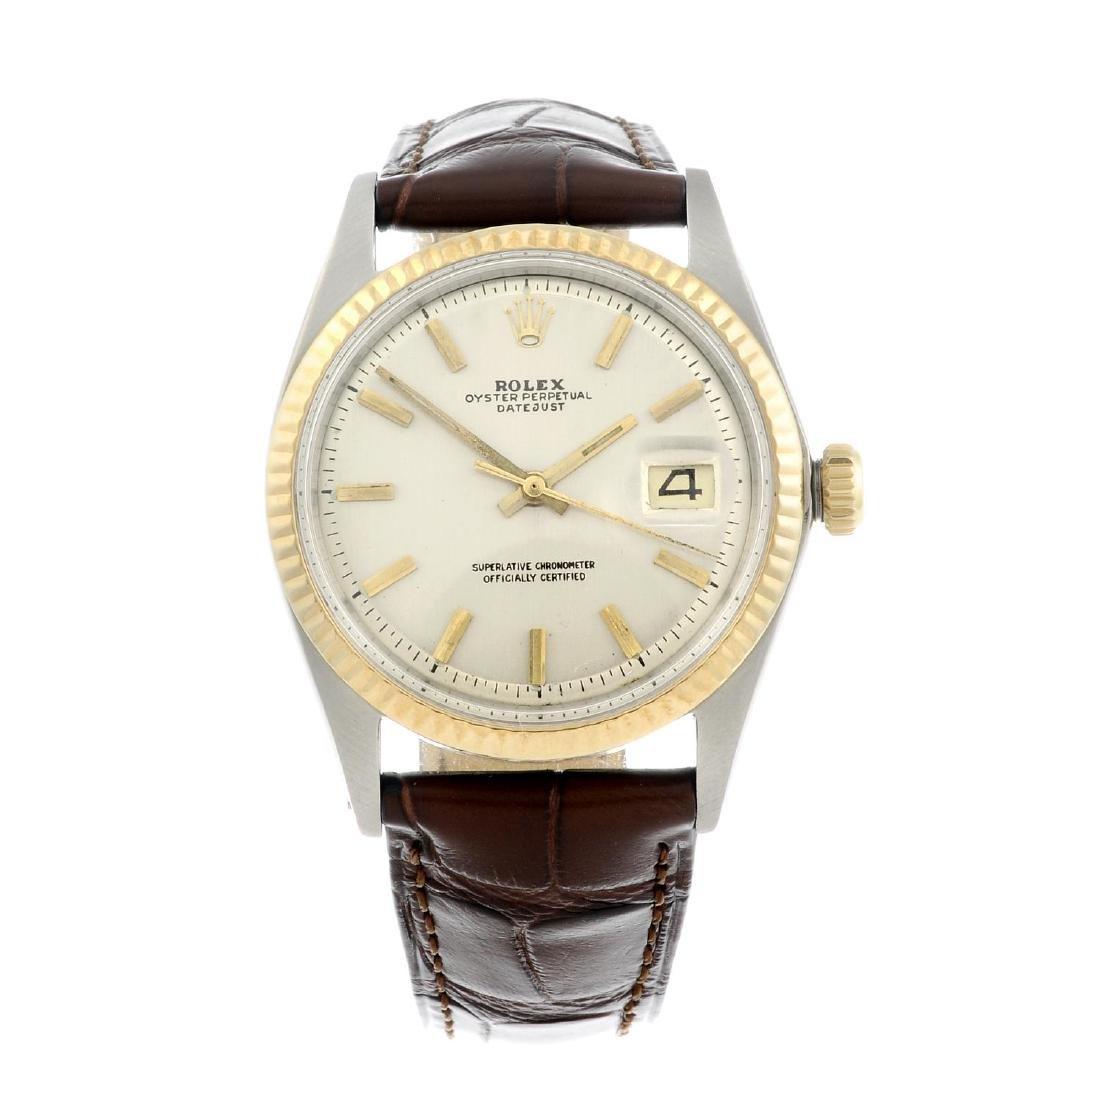 ROLEX - a gentleman's Oyster Perpetual Datejust wrist